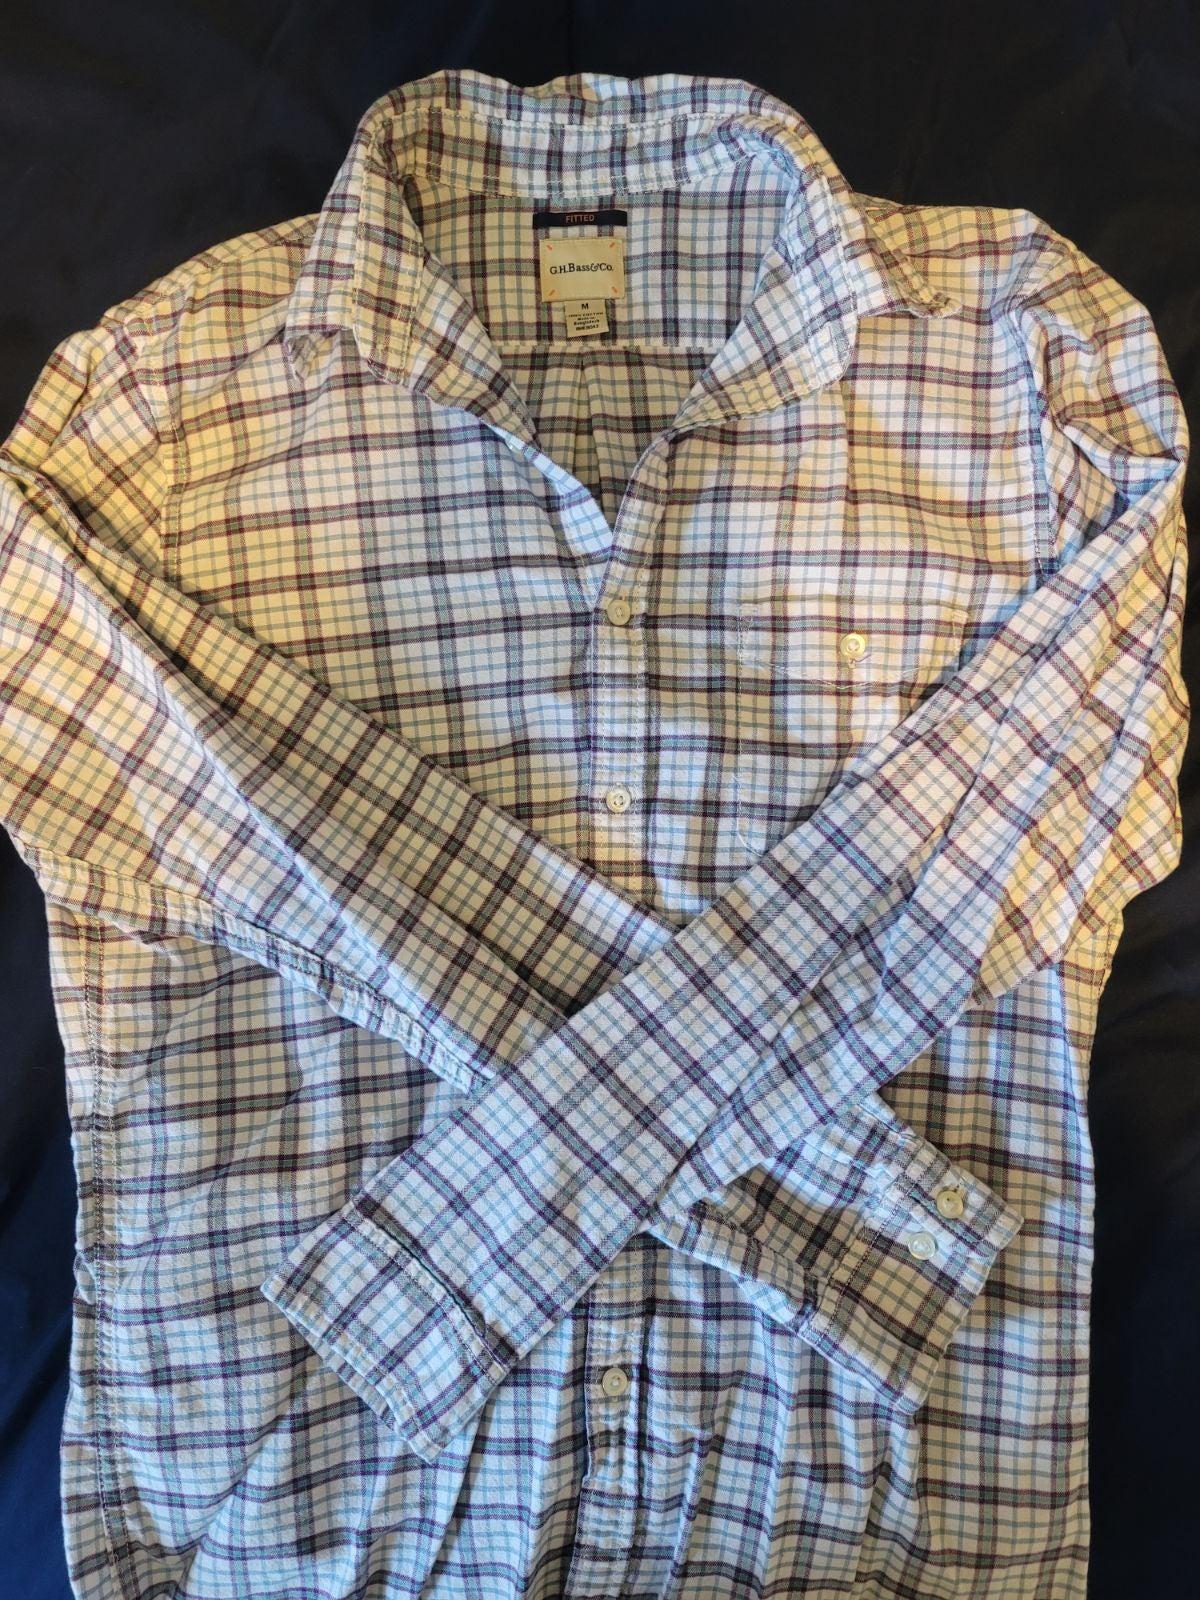 Bass /& CoLong Sleeve Plaid Flannel ShirtGray ComboMEDIUMNWT G.H